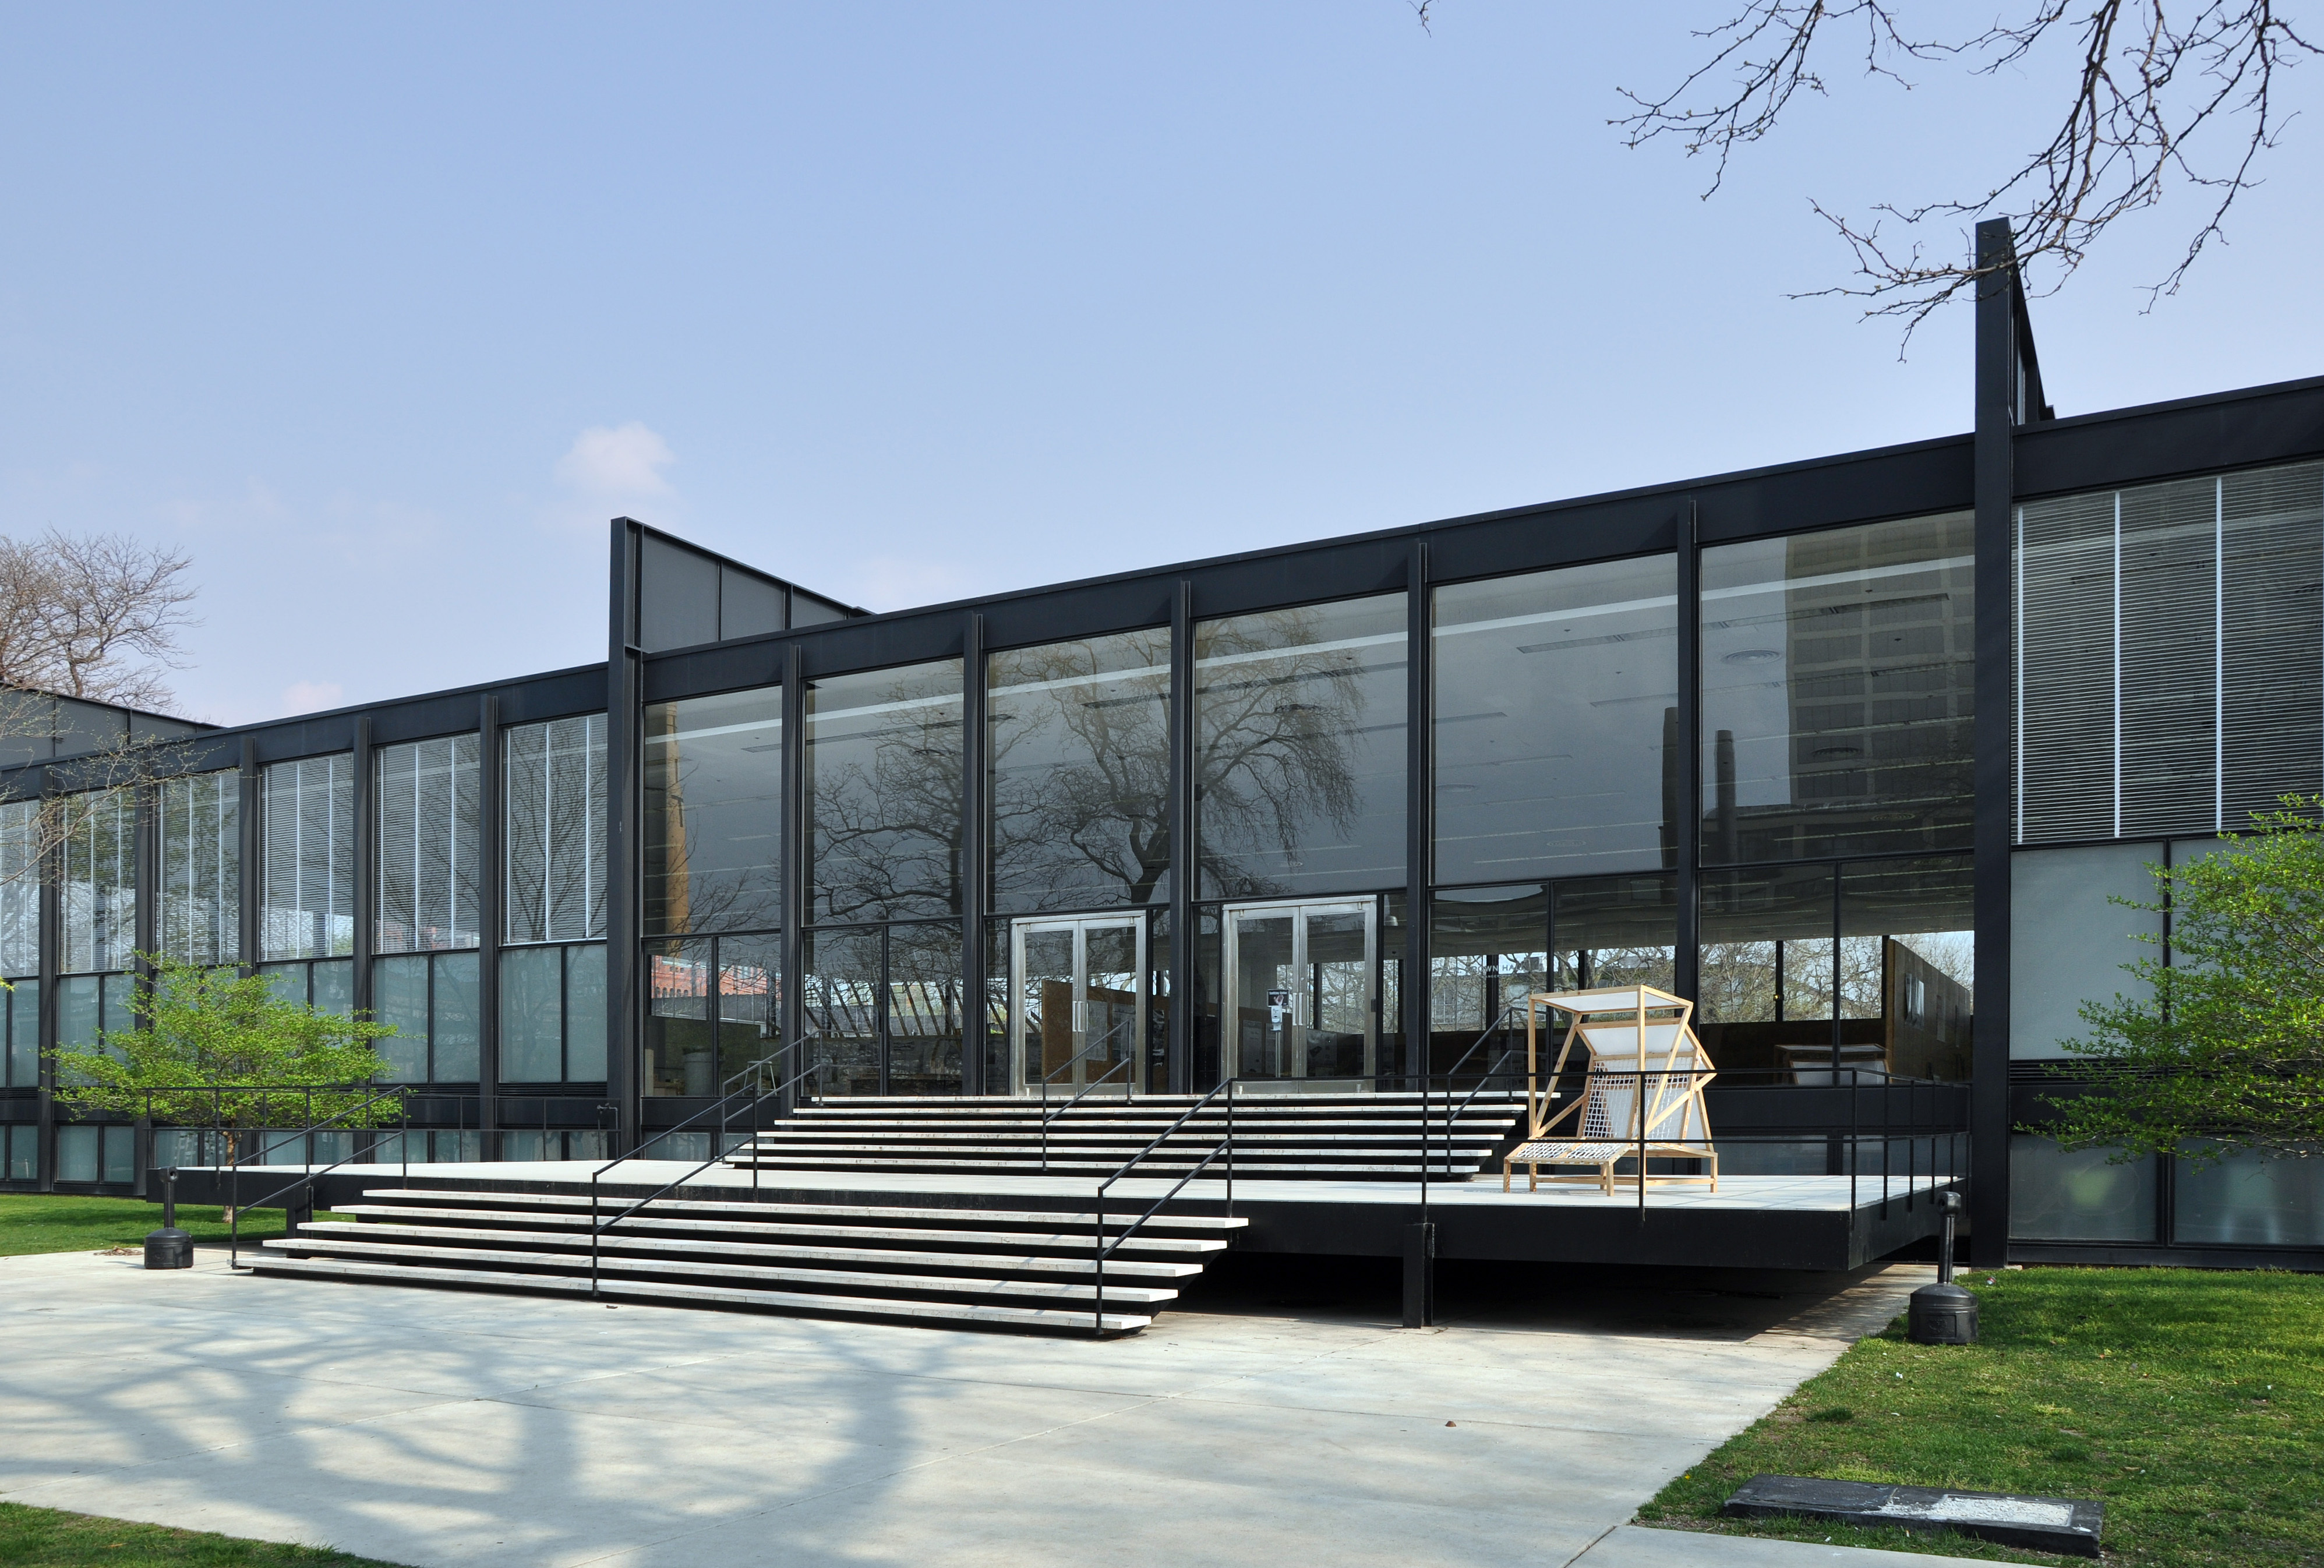 Illinois Tech launches design festival to commemorate Bauhaus heritage